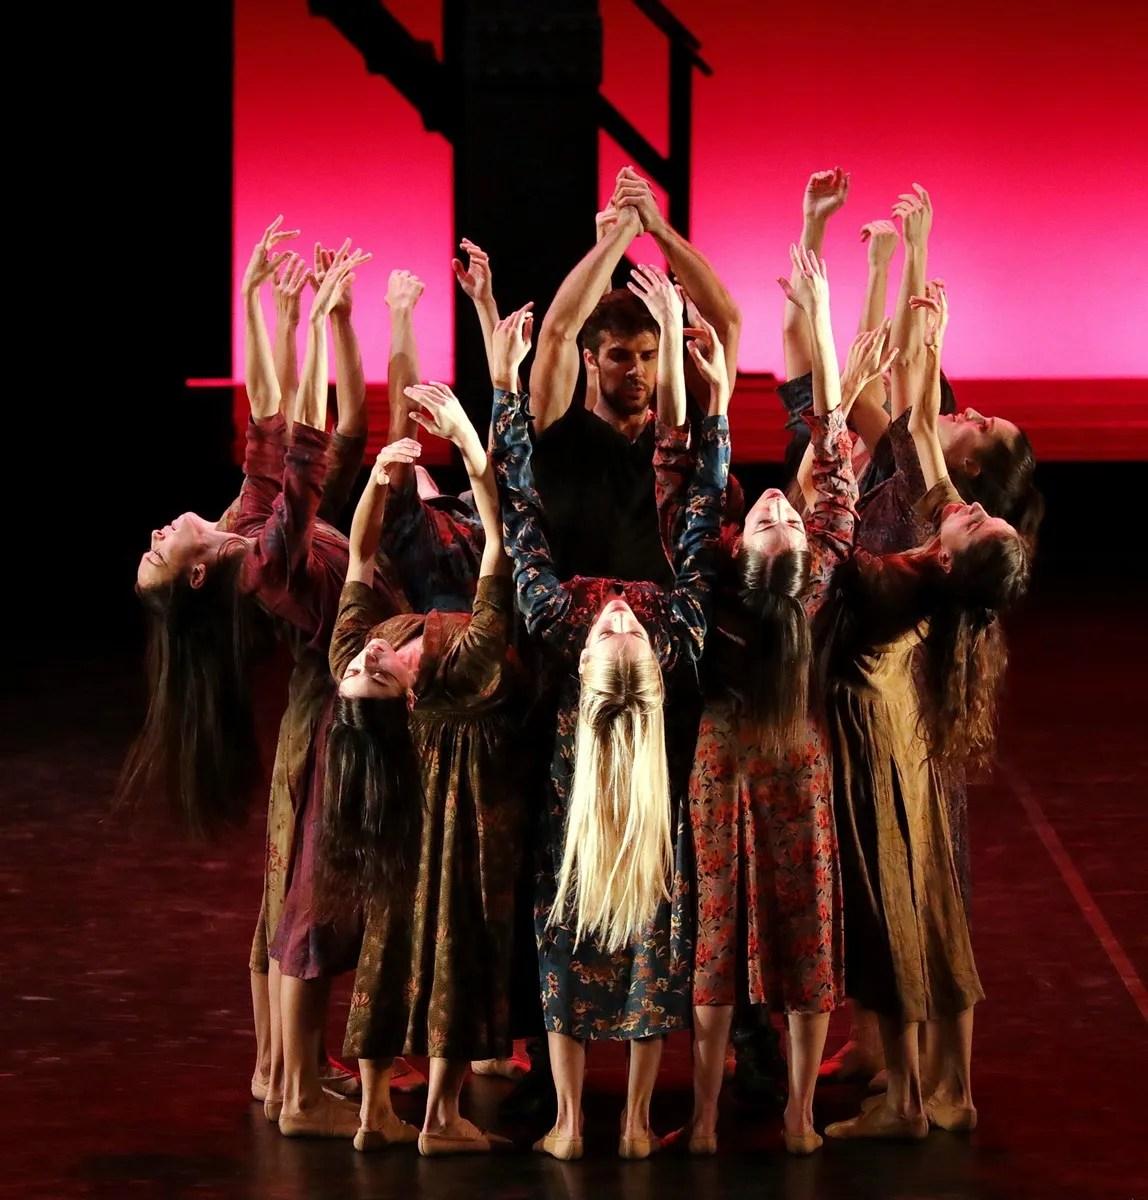 Madina - 39 - Roberto Bolle and the corps de ballet, photo by Brescia e Amisano ©Teatro alla Scala (4)